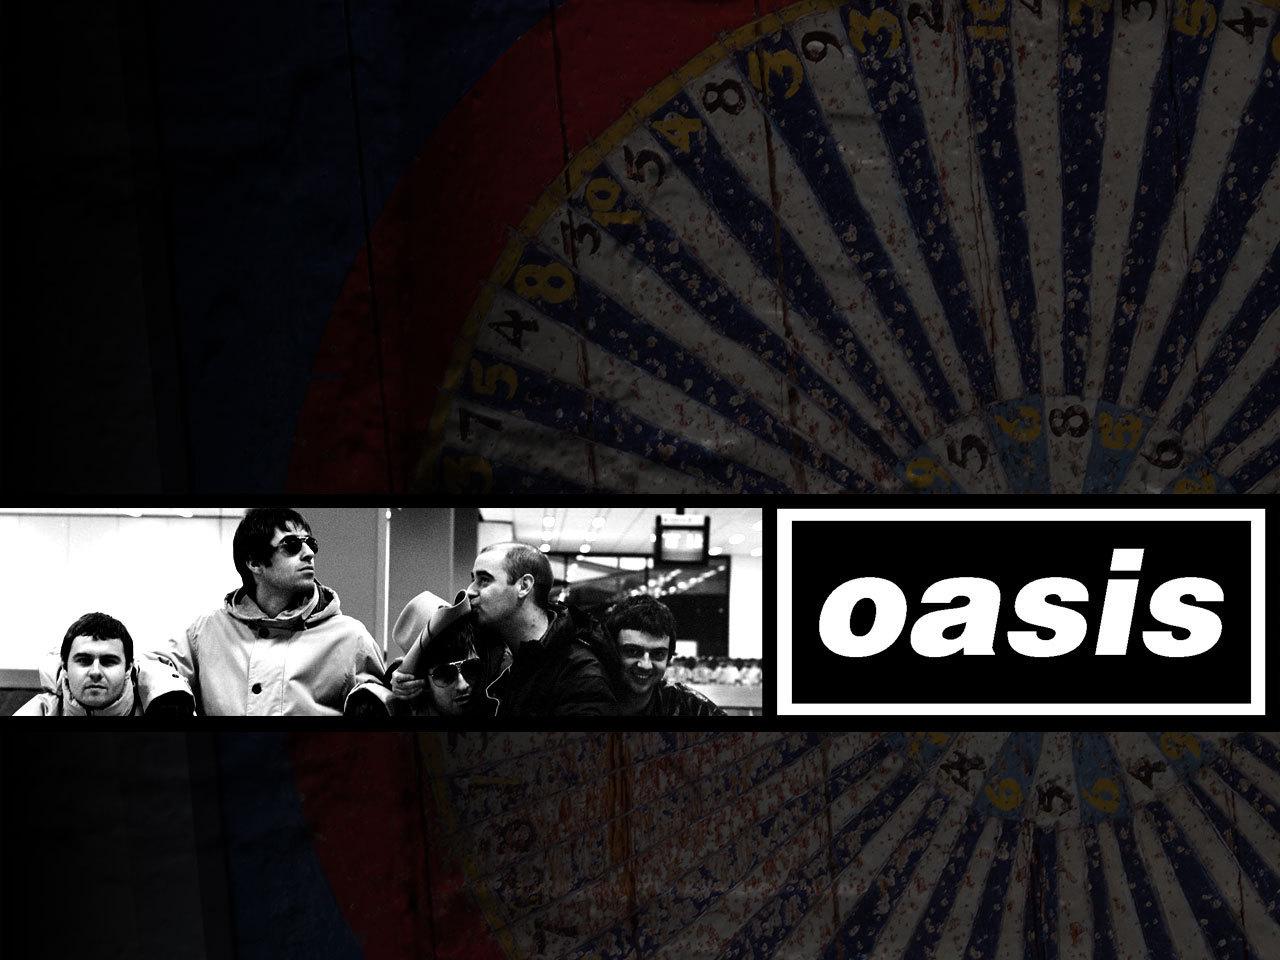 Oasis Wallpaper   Oasis Wallpaper 2352920 1280x960